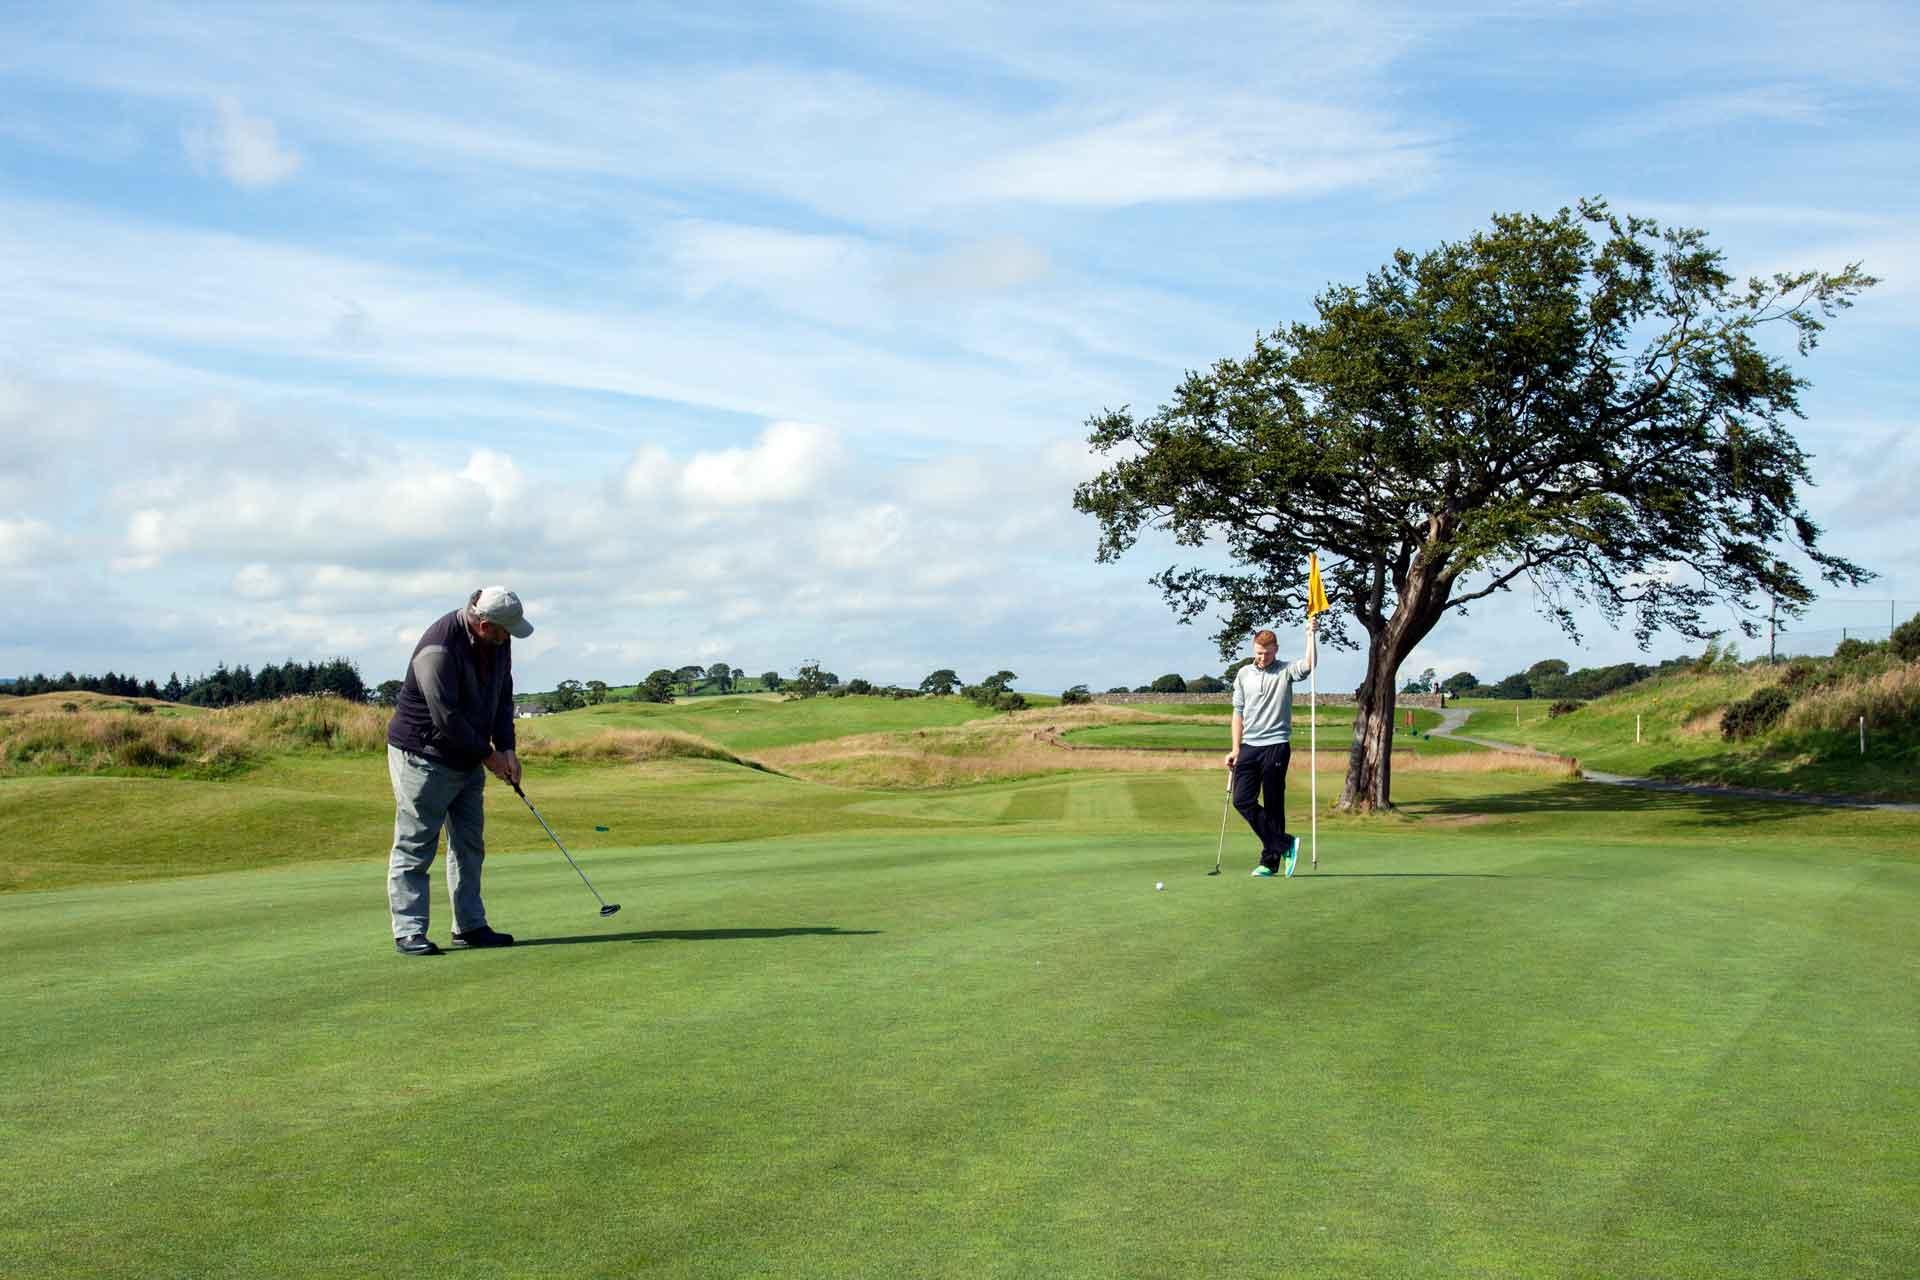 Playsport Golf East Kilbride